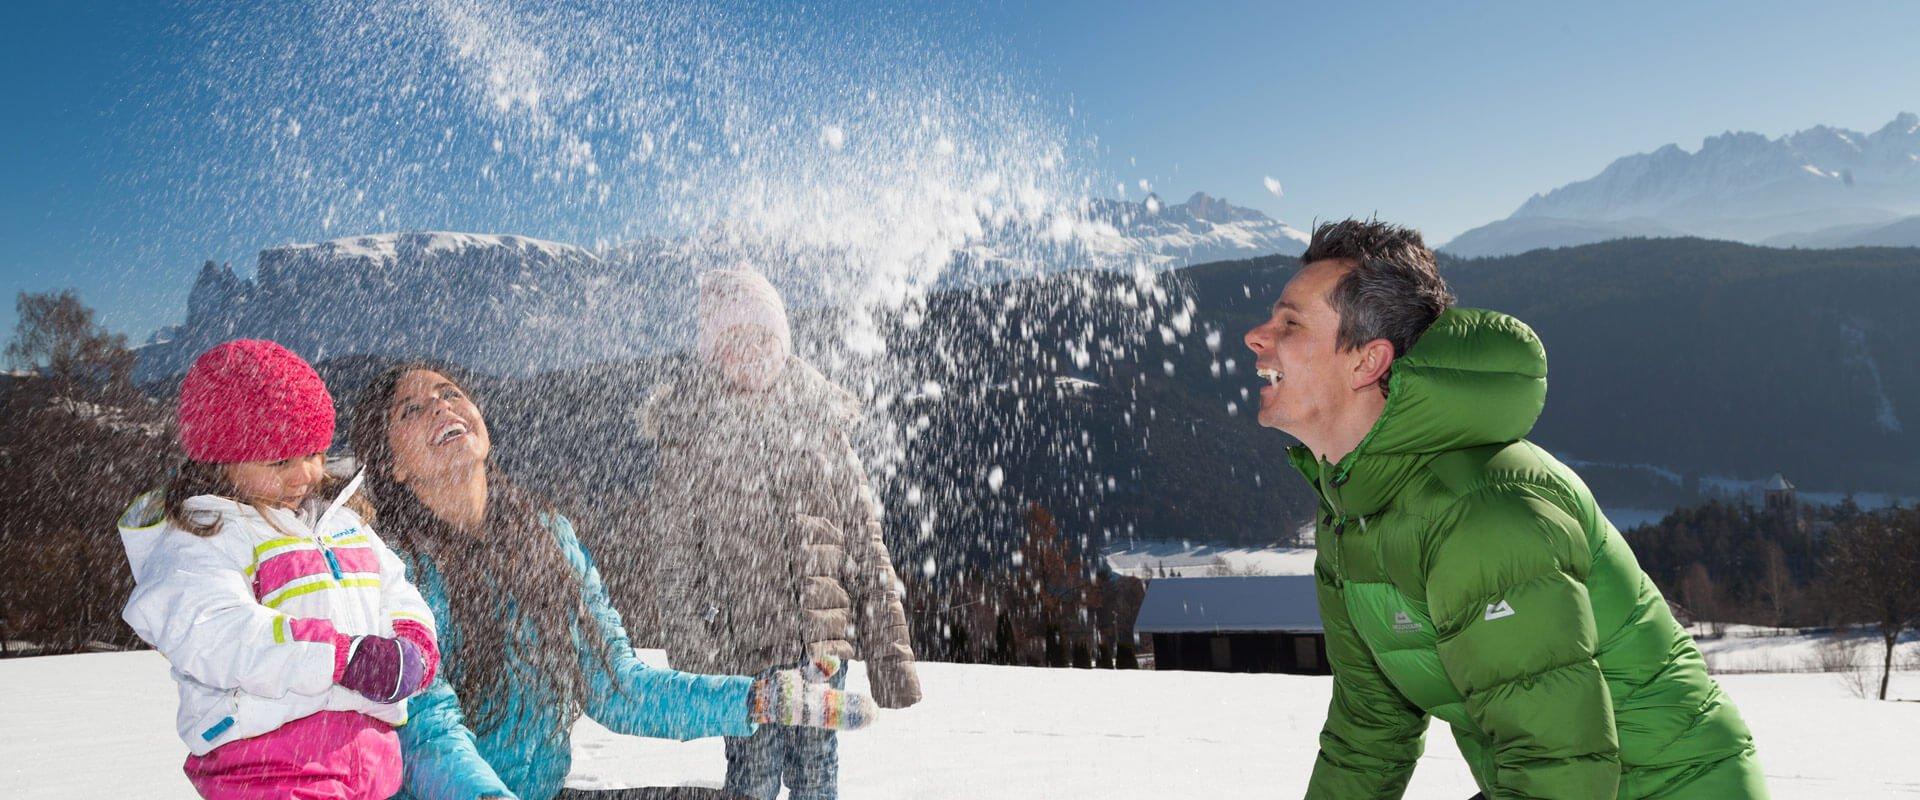 winterurlaub-ritten-05